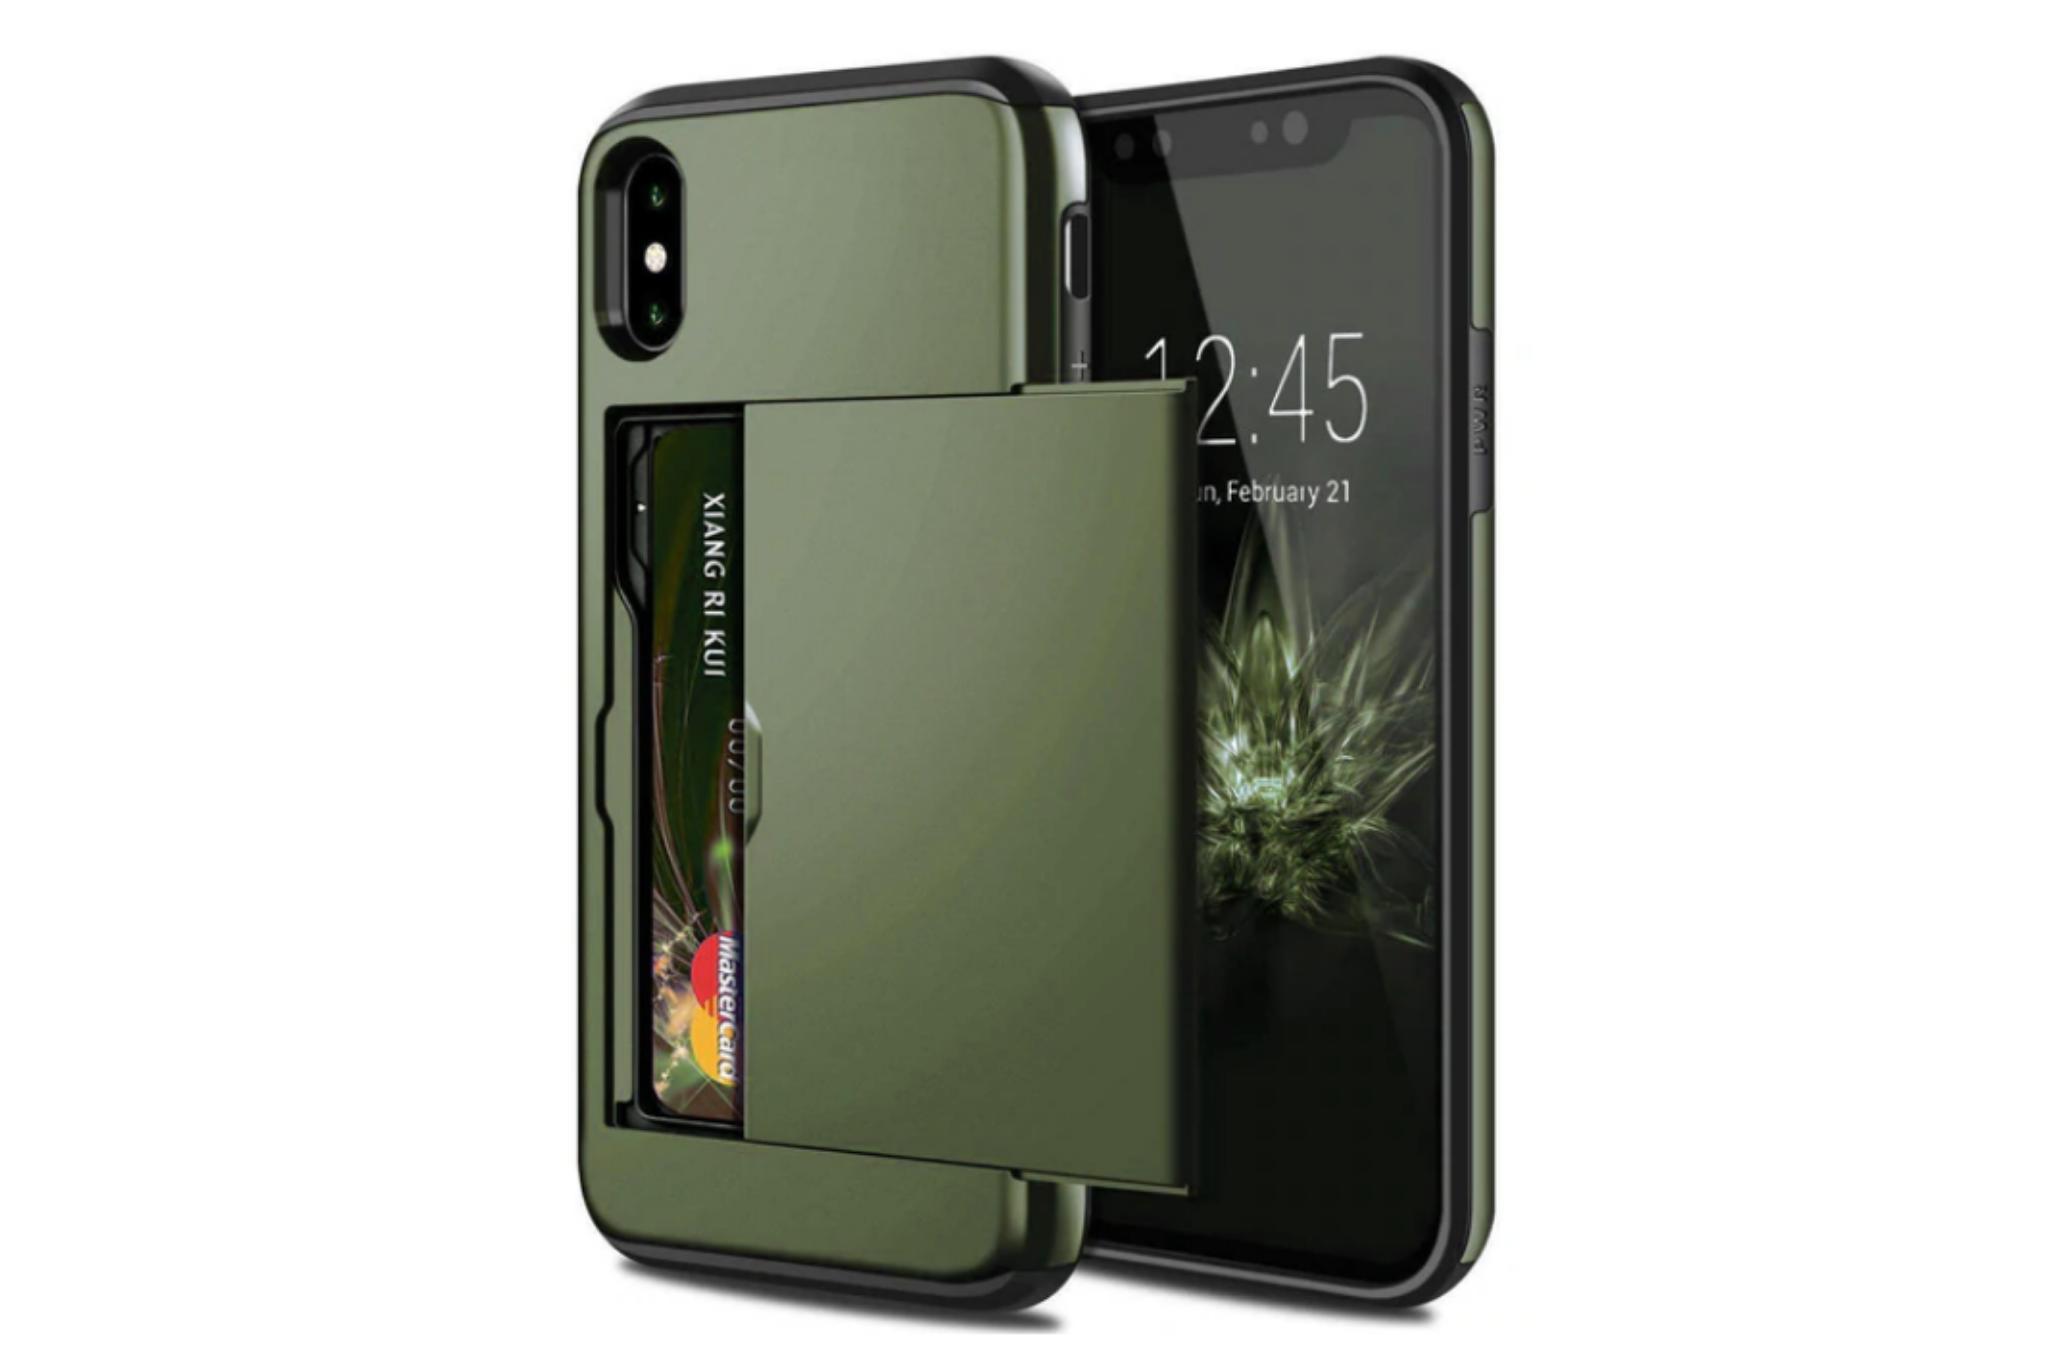 Smartphonehoesje iPhone XR | Pasjesschuif groen